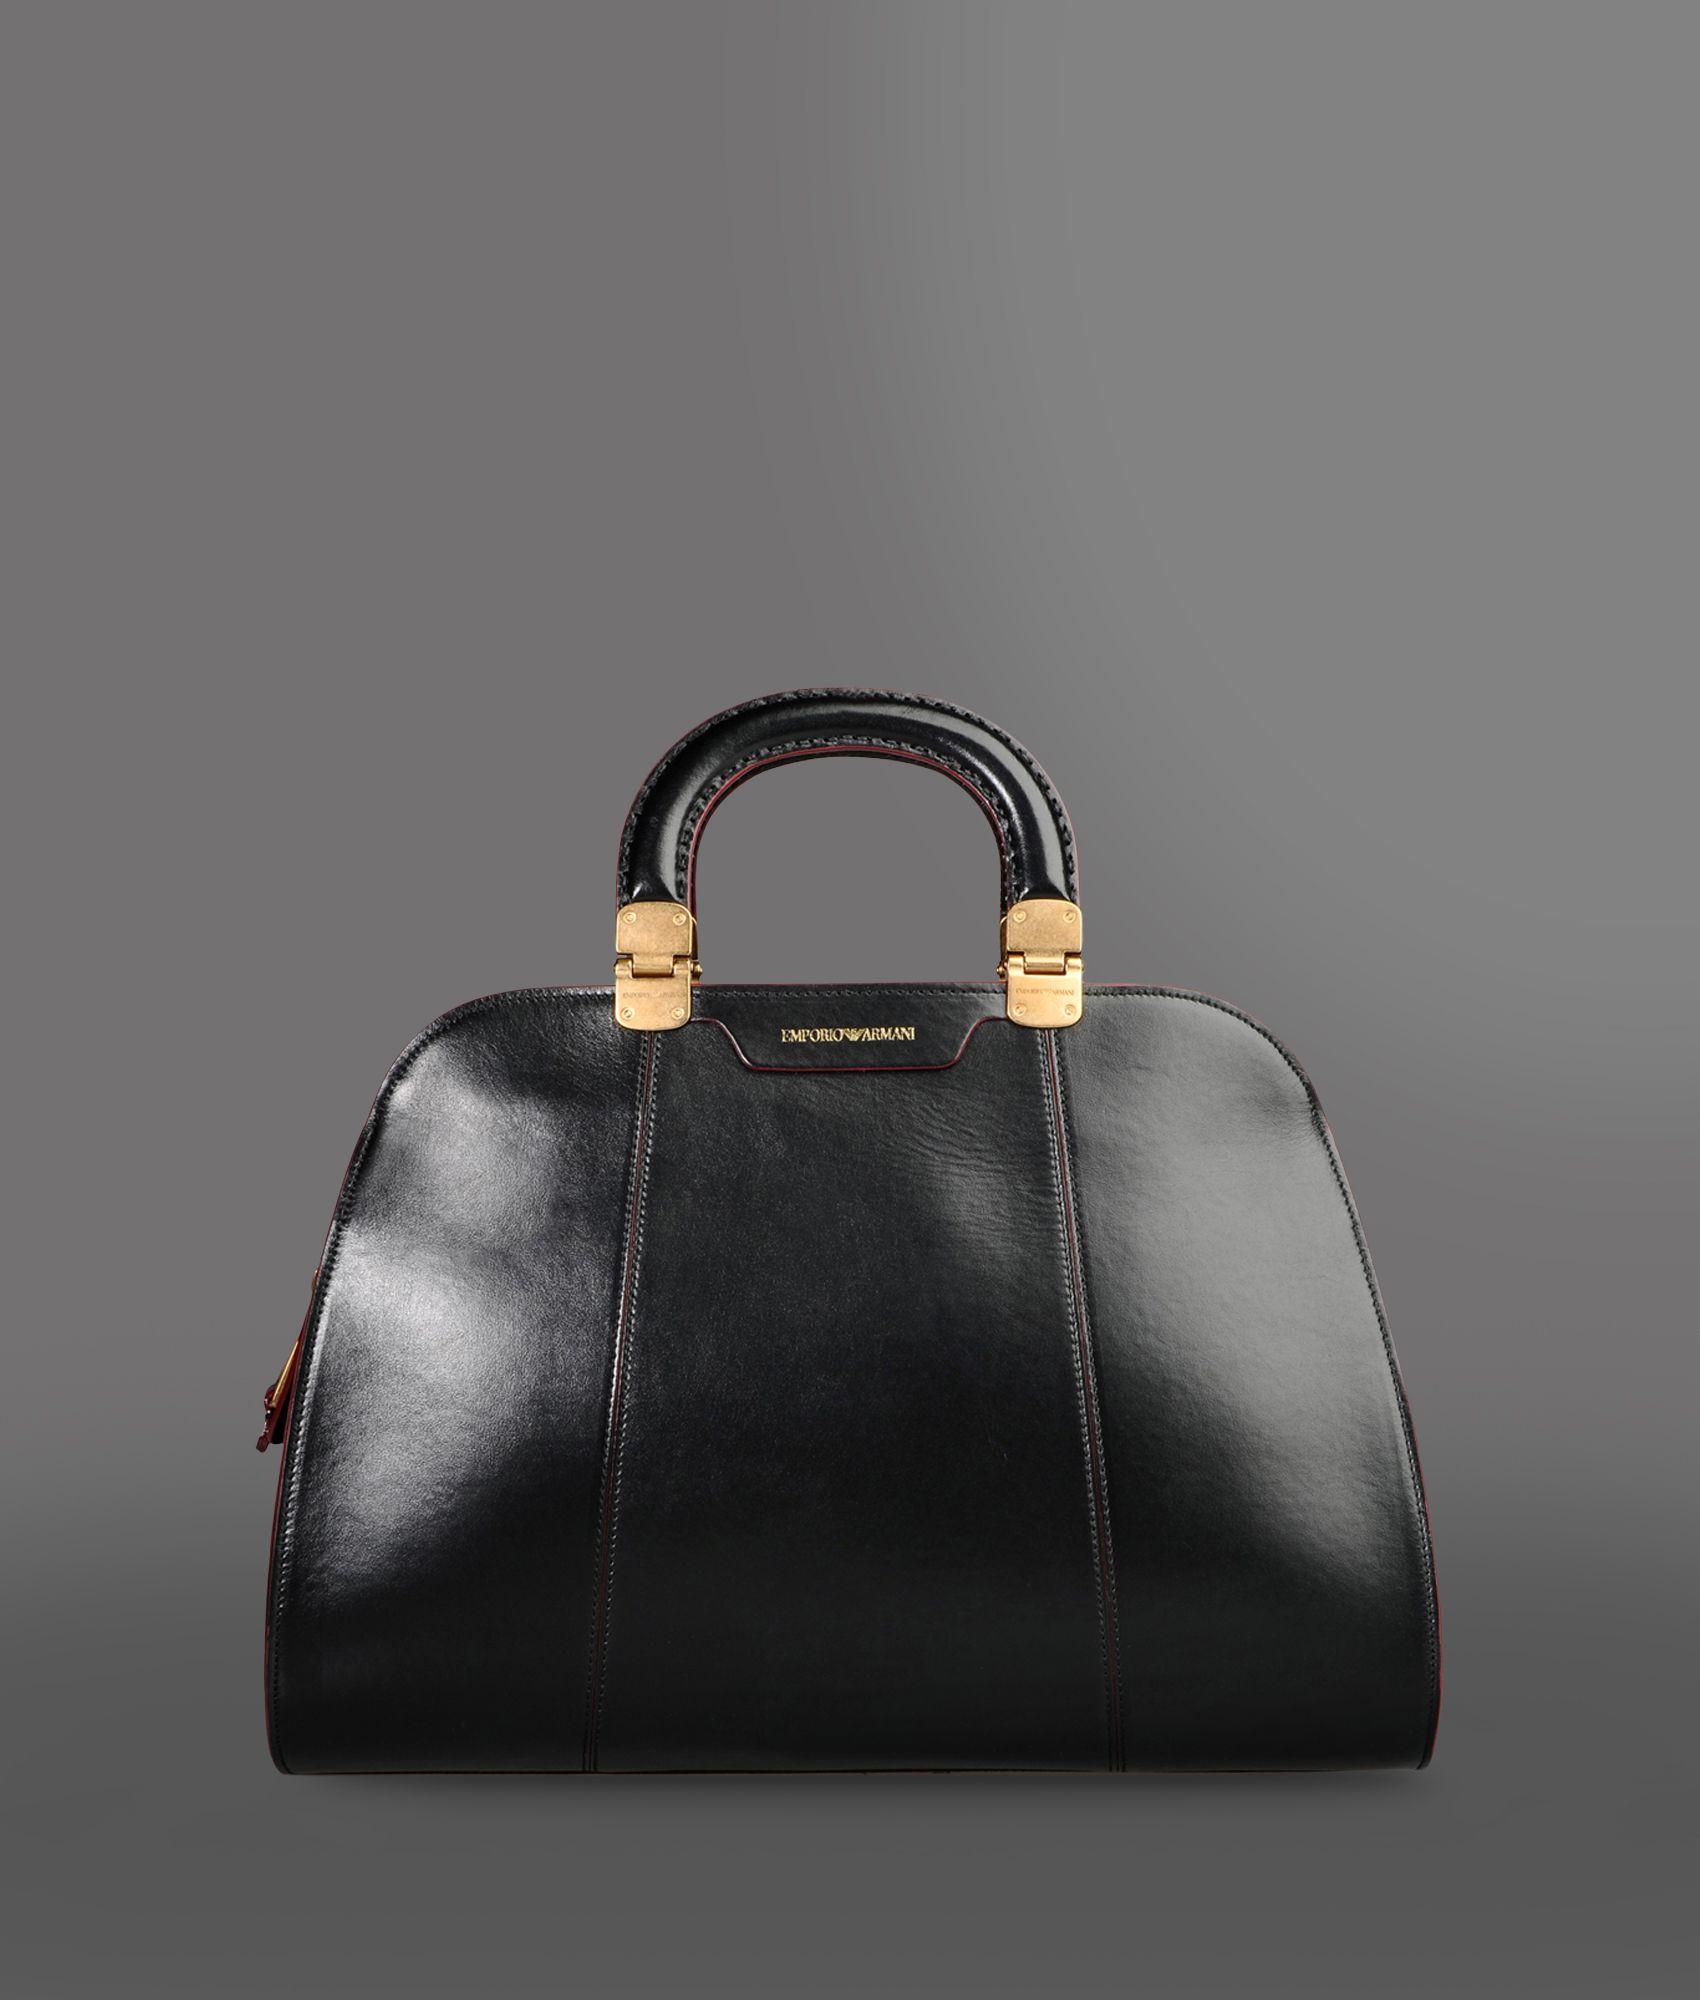 emporio armani sac main in black lyst. Black Bedroom Furniture Sets. Home Design Ideas